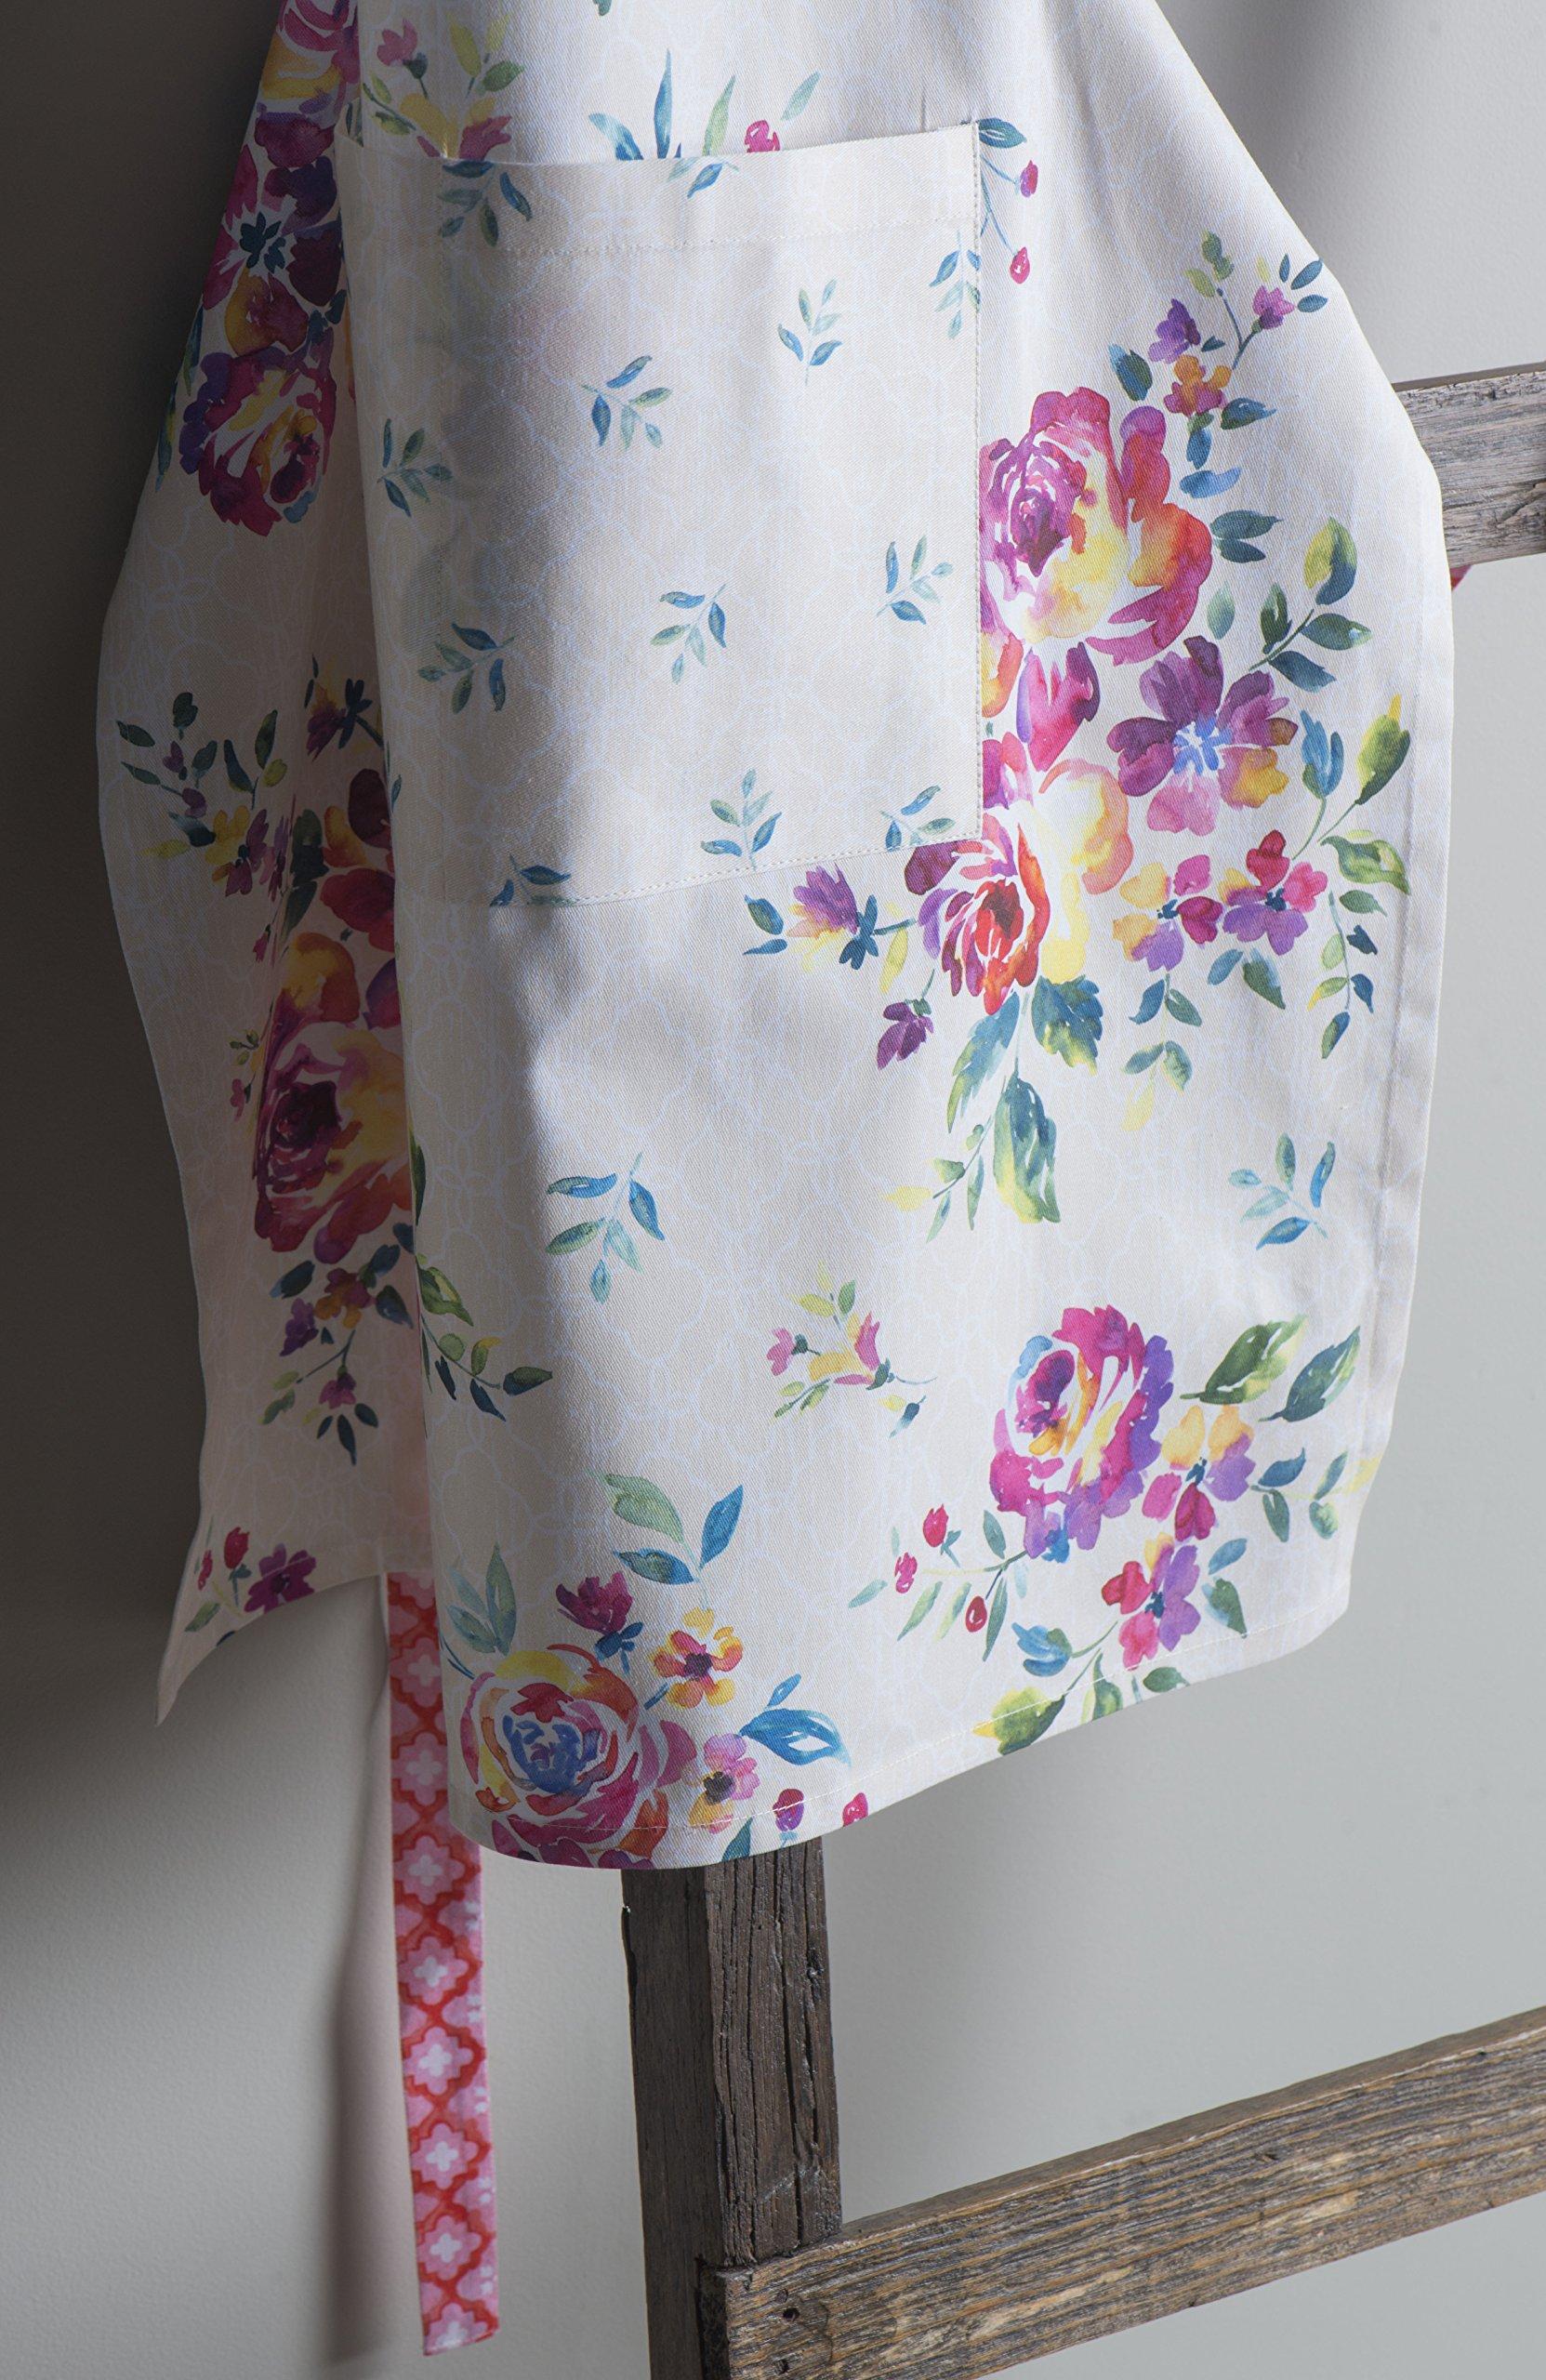 Maison d' Hermine Rose Garden 100% Cotton Apron with an adjustable neck & Visible center pocket 27.50 Inch by 31.50 Inch by Maison d' Hermine (Image #5)